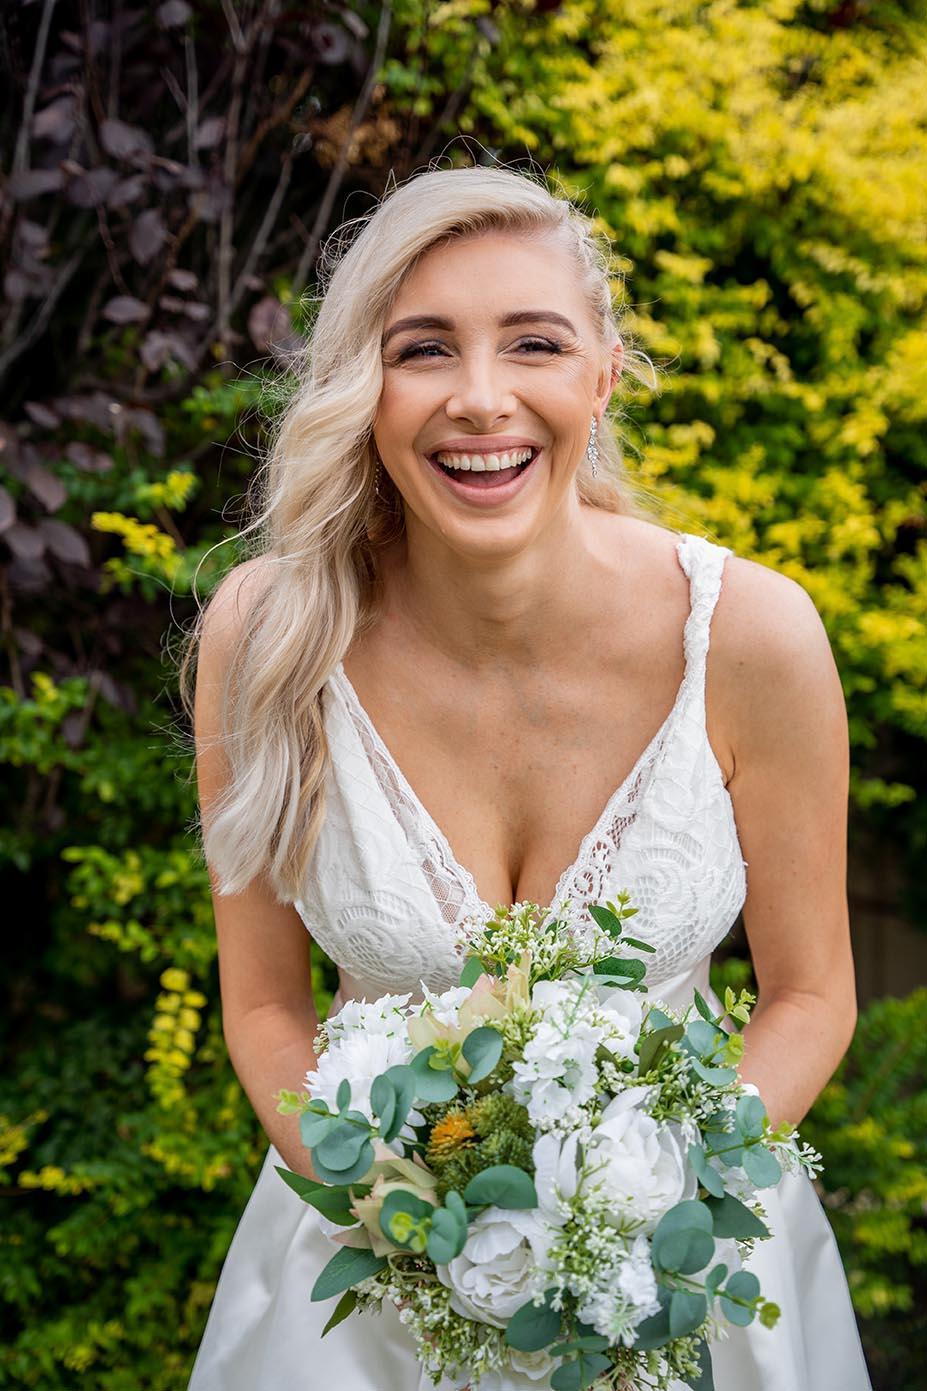 Wedding Photography - smiling bride